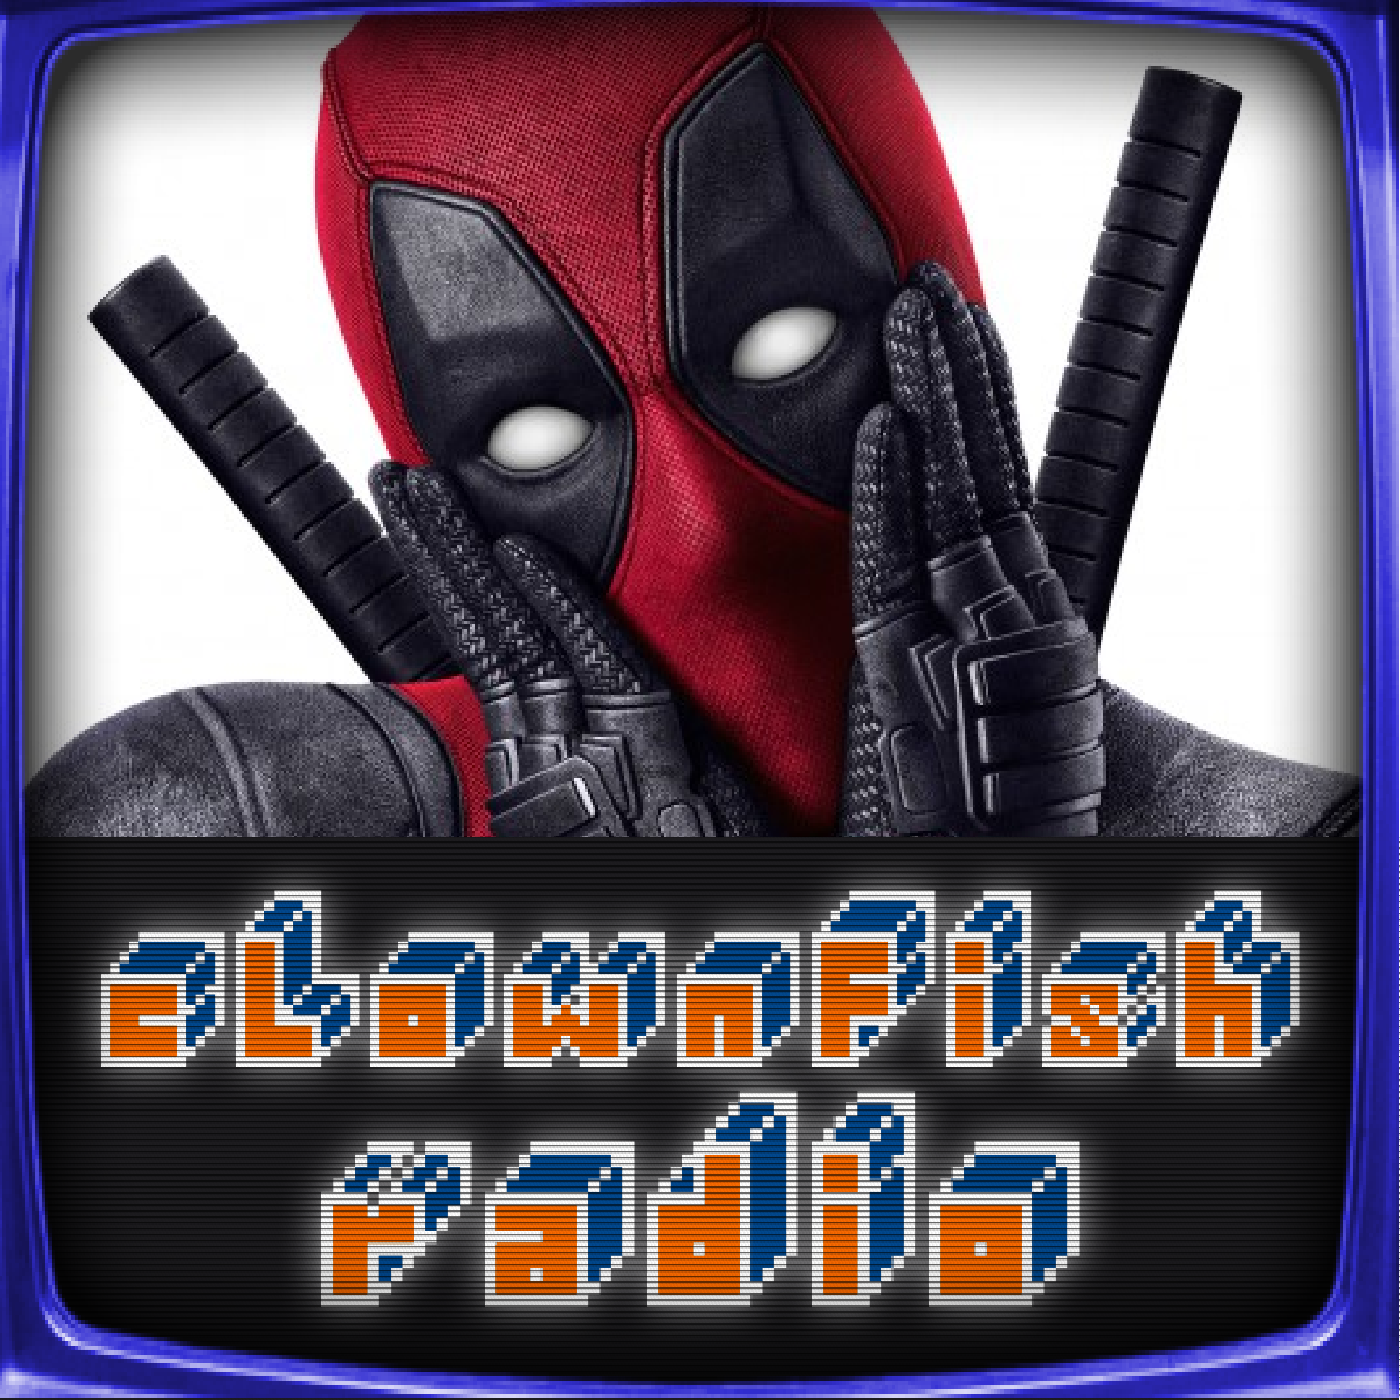 Deadpool. Deadpool? DEADPOOL!